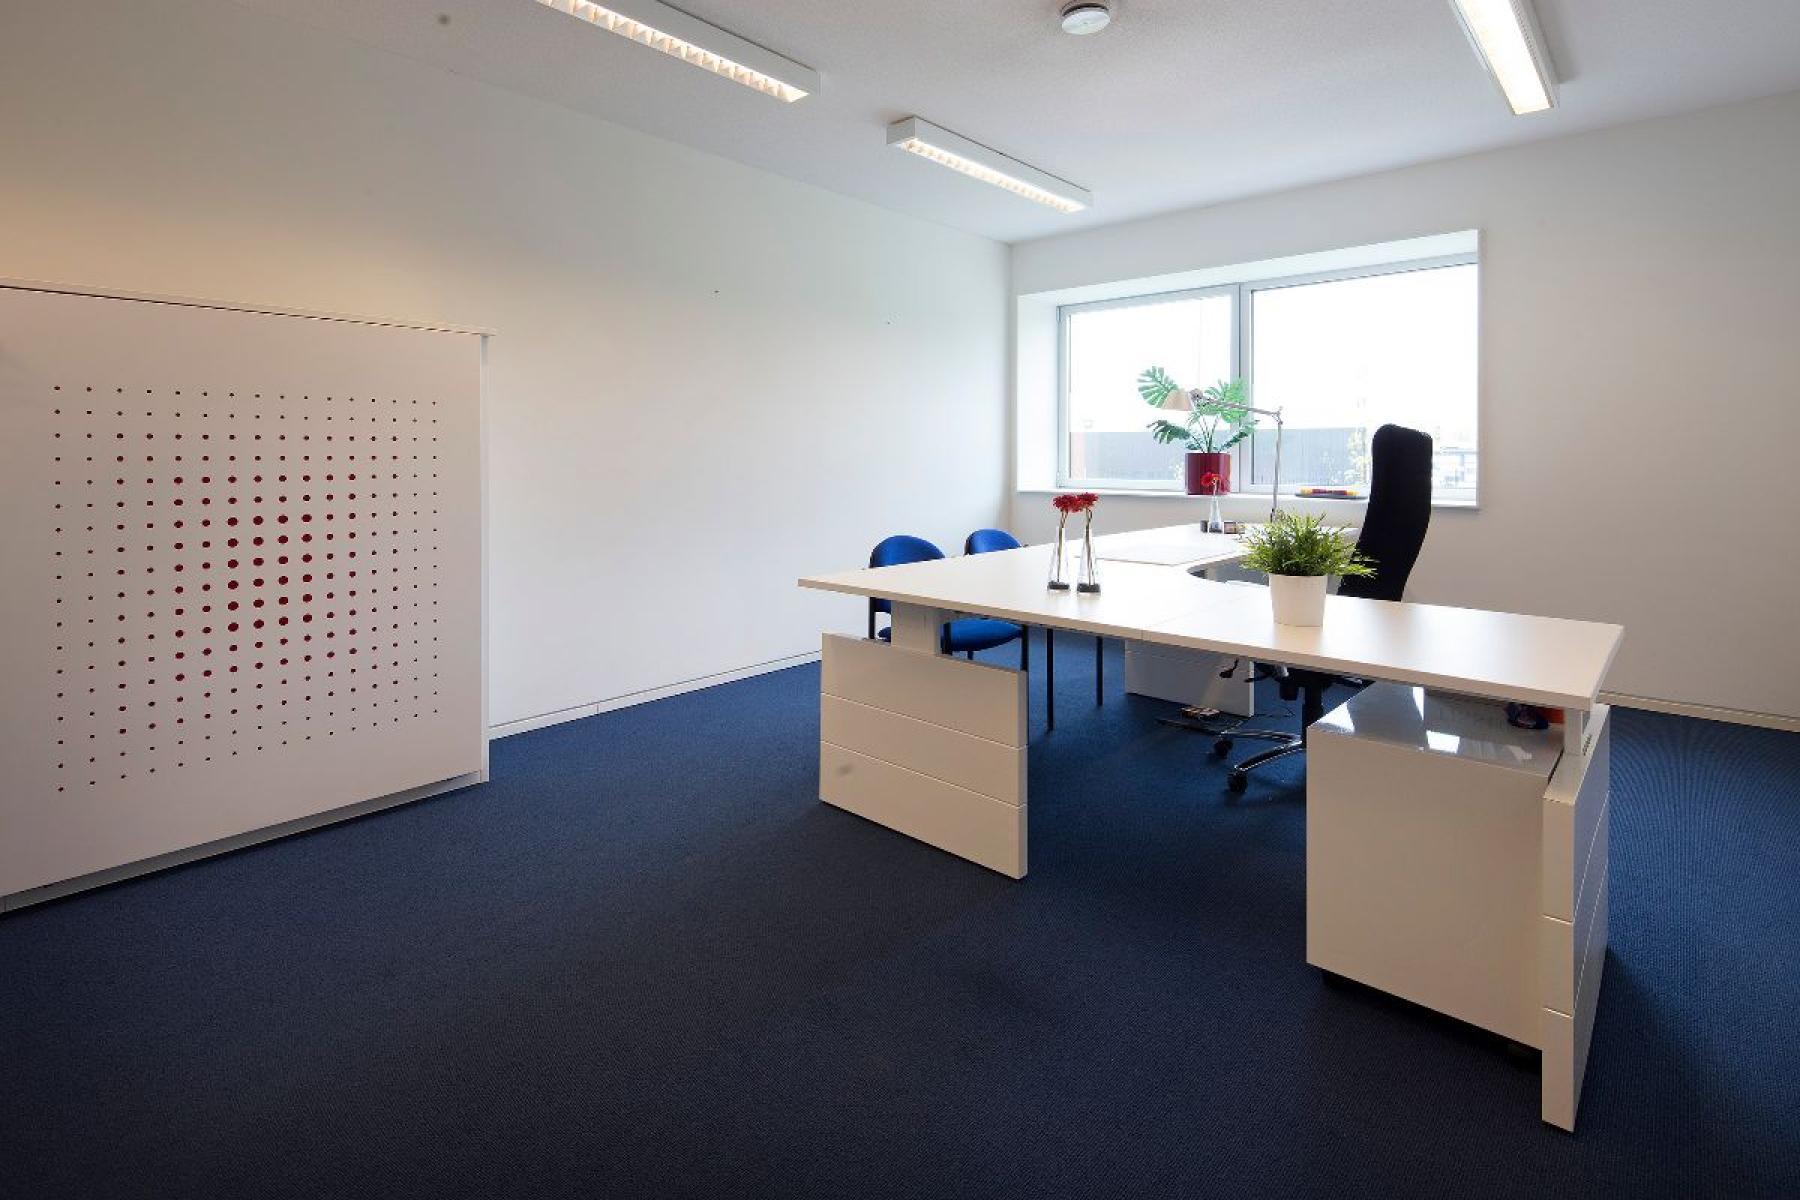 An office space in Geelen